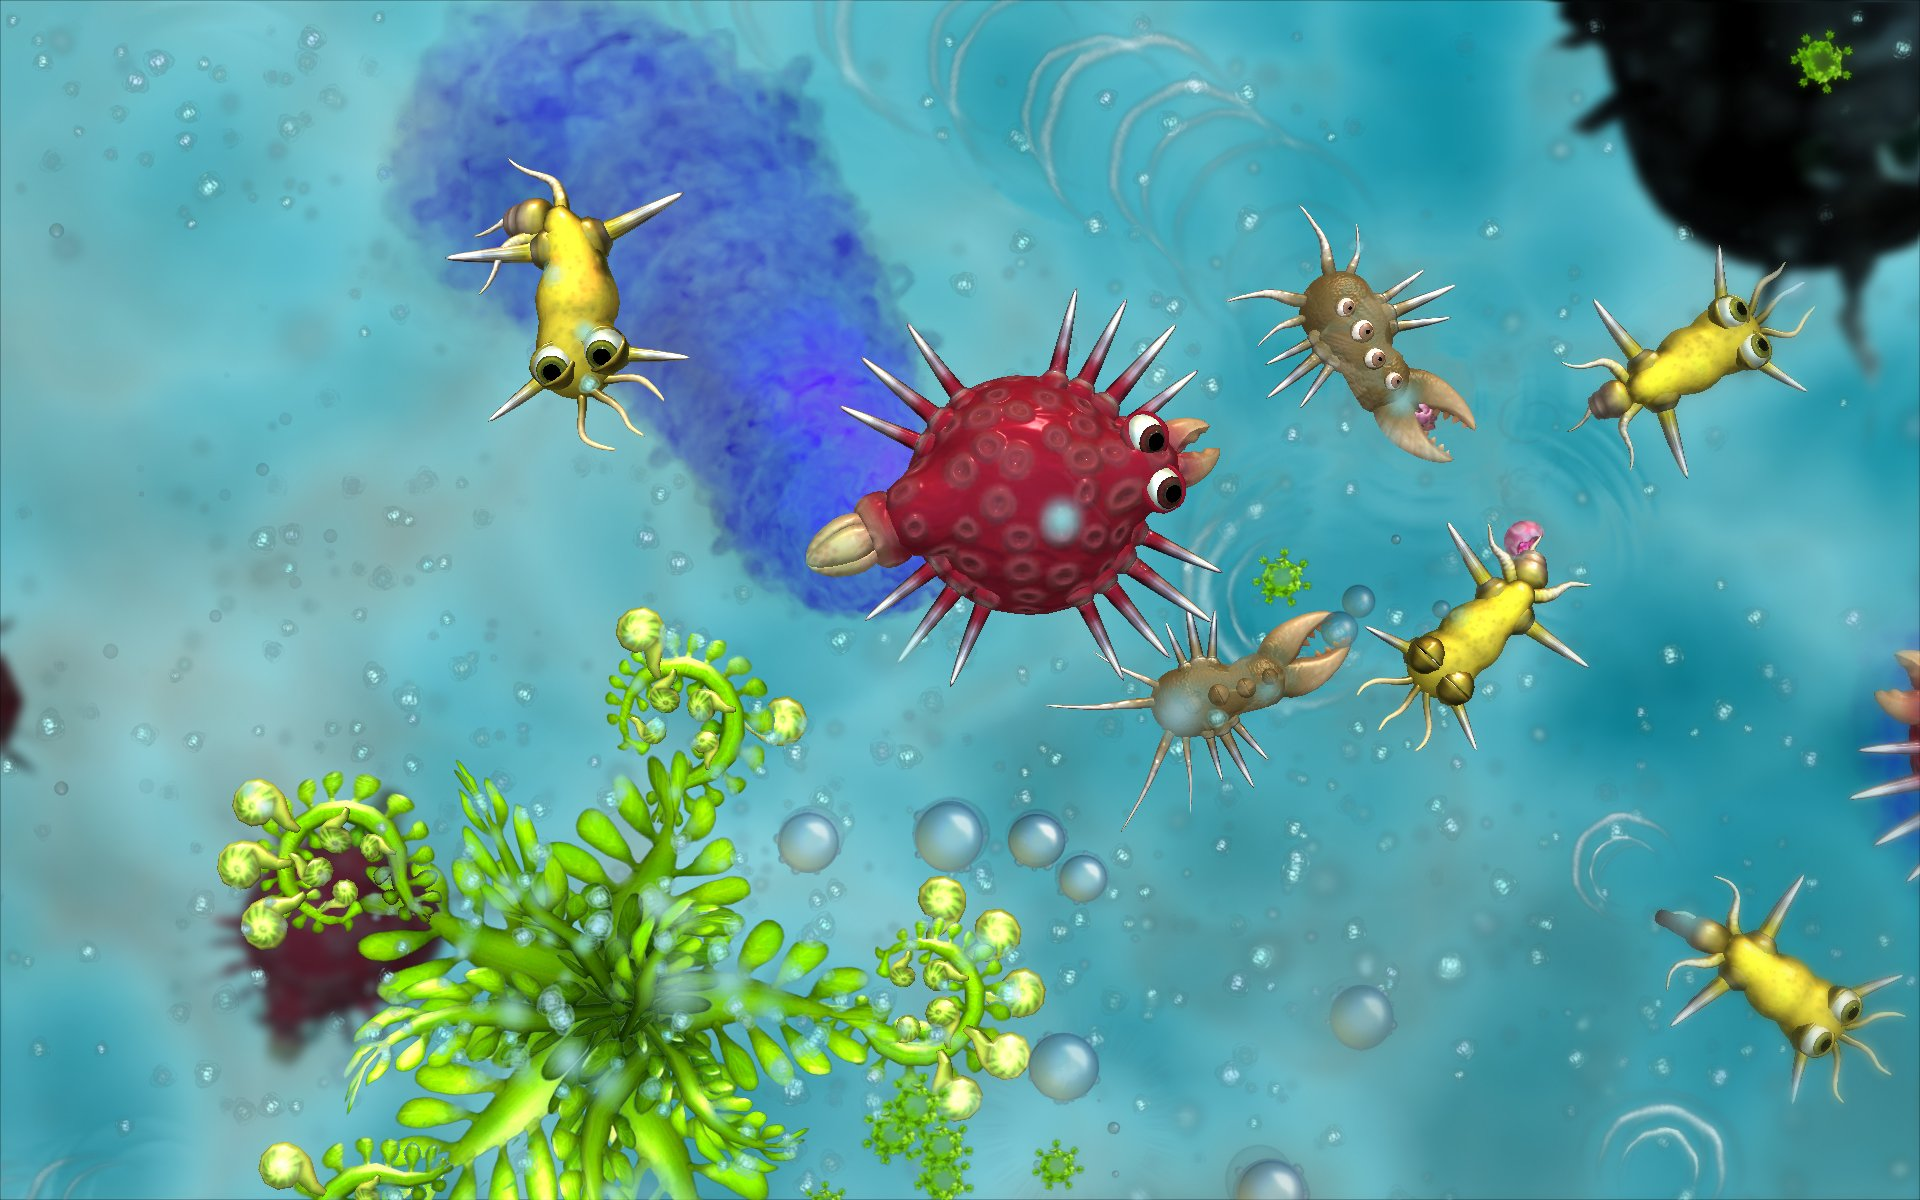 Spore - Gameplay